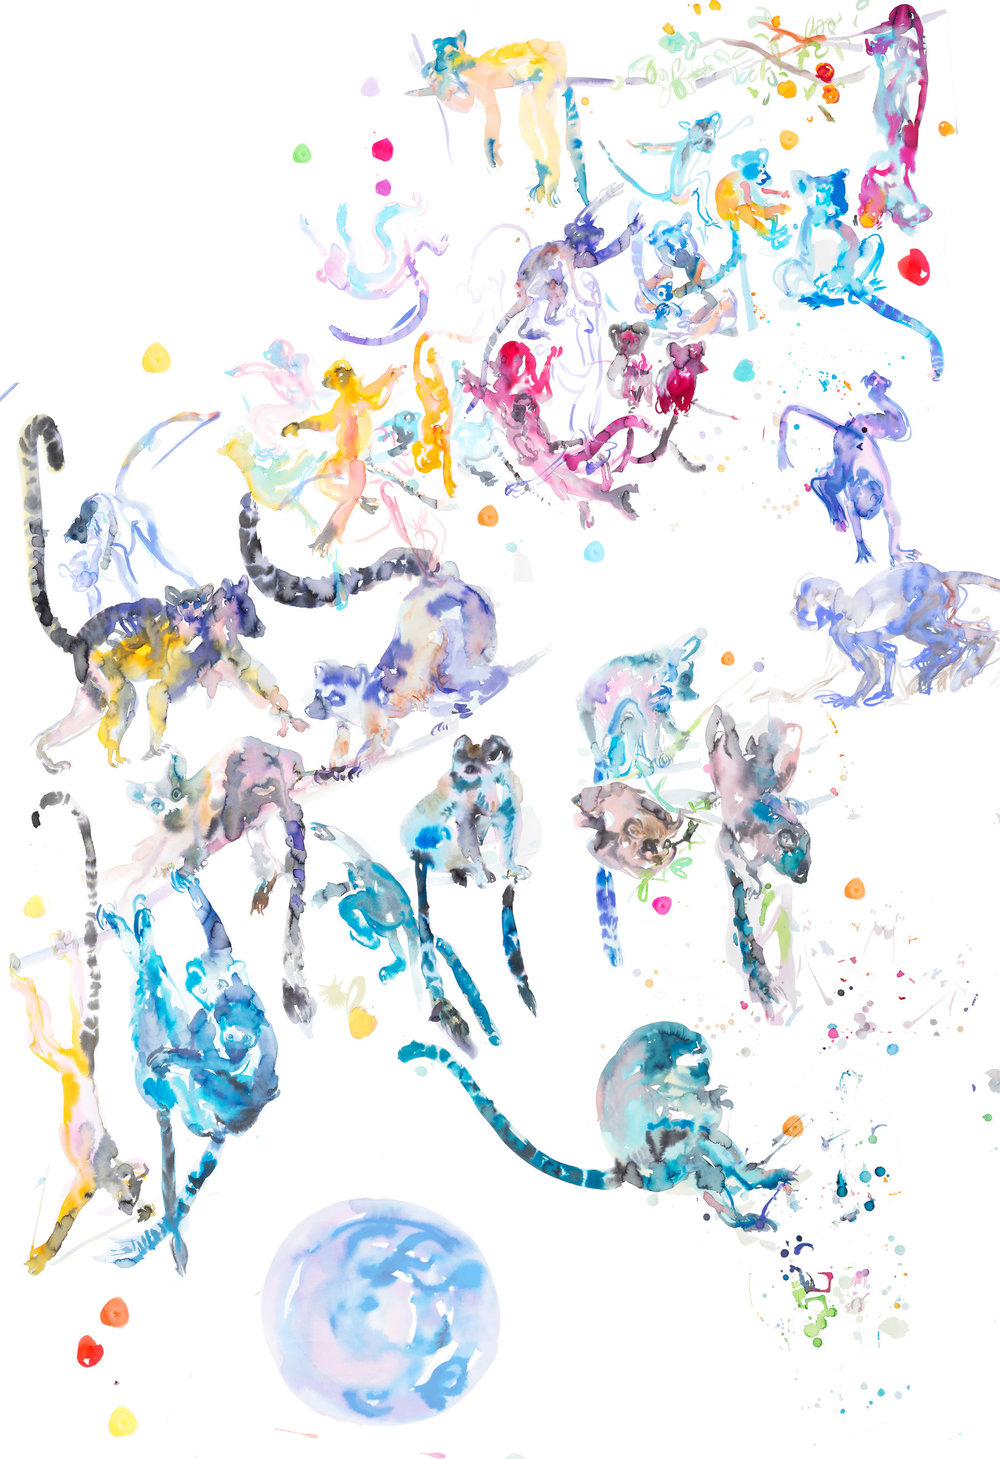 jungletableau a - ARTWORK DETAILS:Fine Art print of original watercolor painting.Limited editionWidth: 68 cm (approx 27